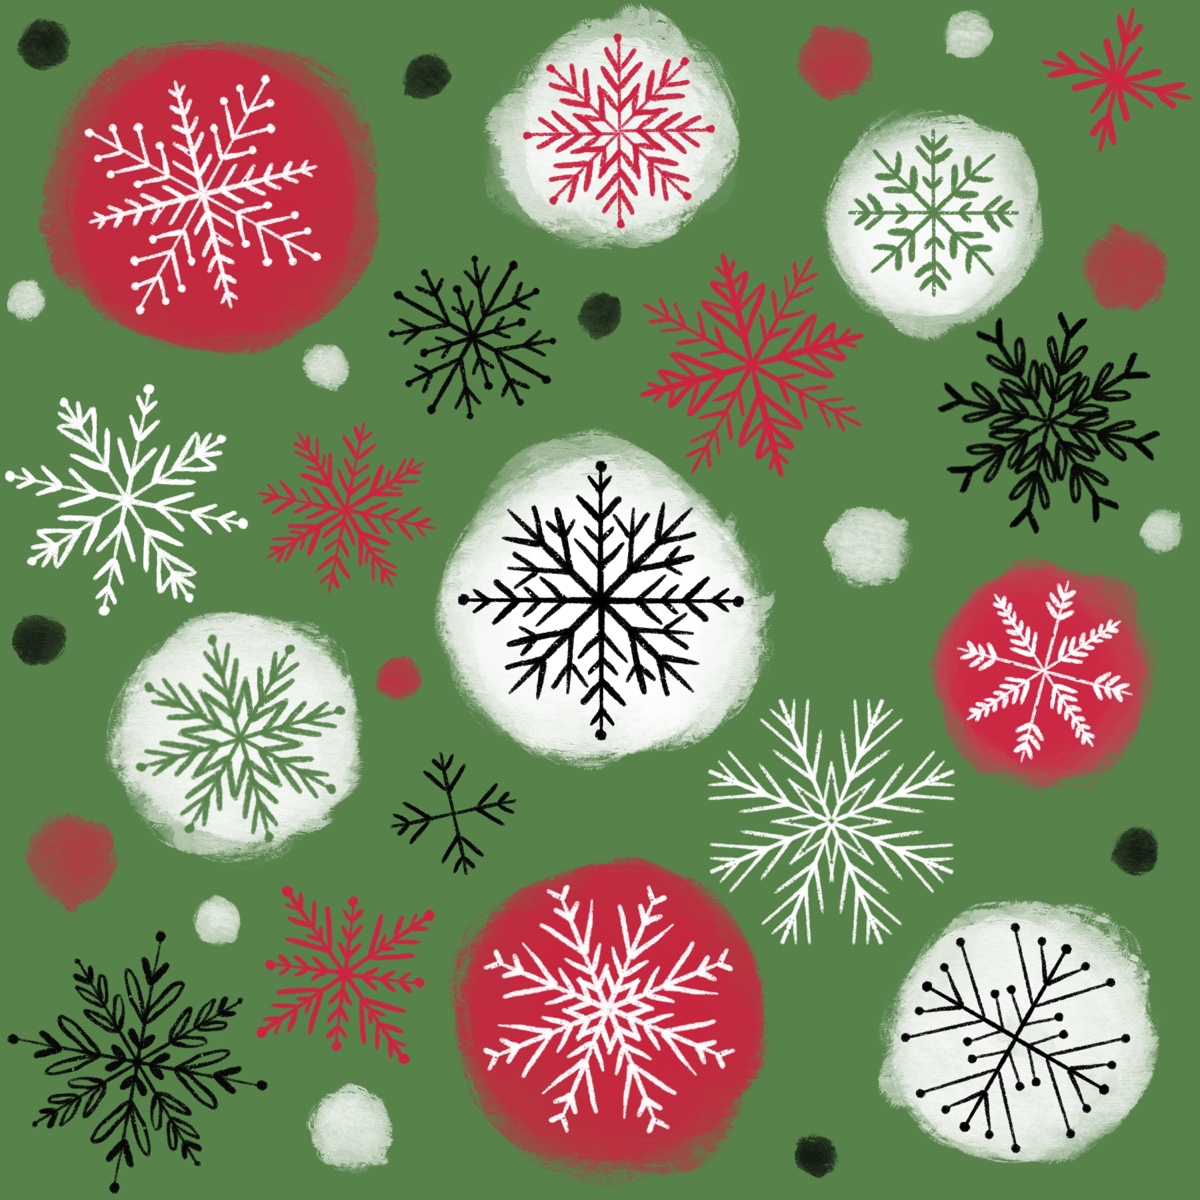 jjd-christmas_snowflurry